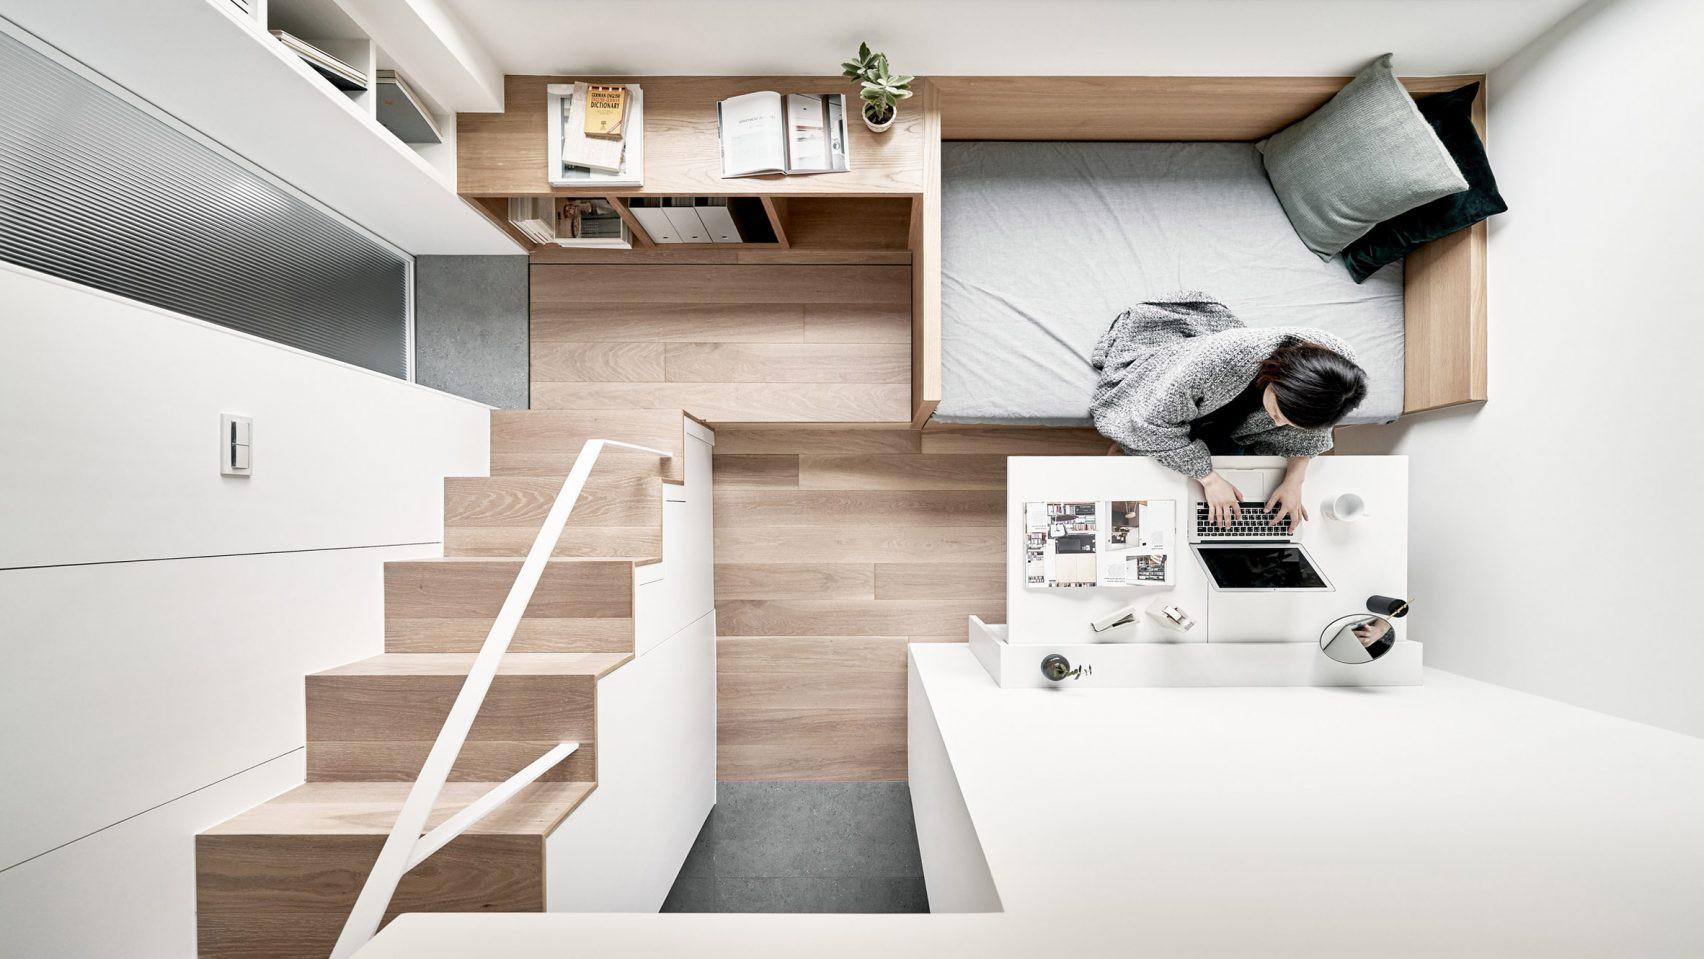 tiny-apartment-a-little-design-residential-interiors-taipei-taiwan_dezeen_2364_hero2-1704x959